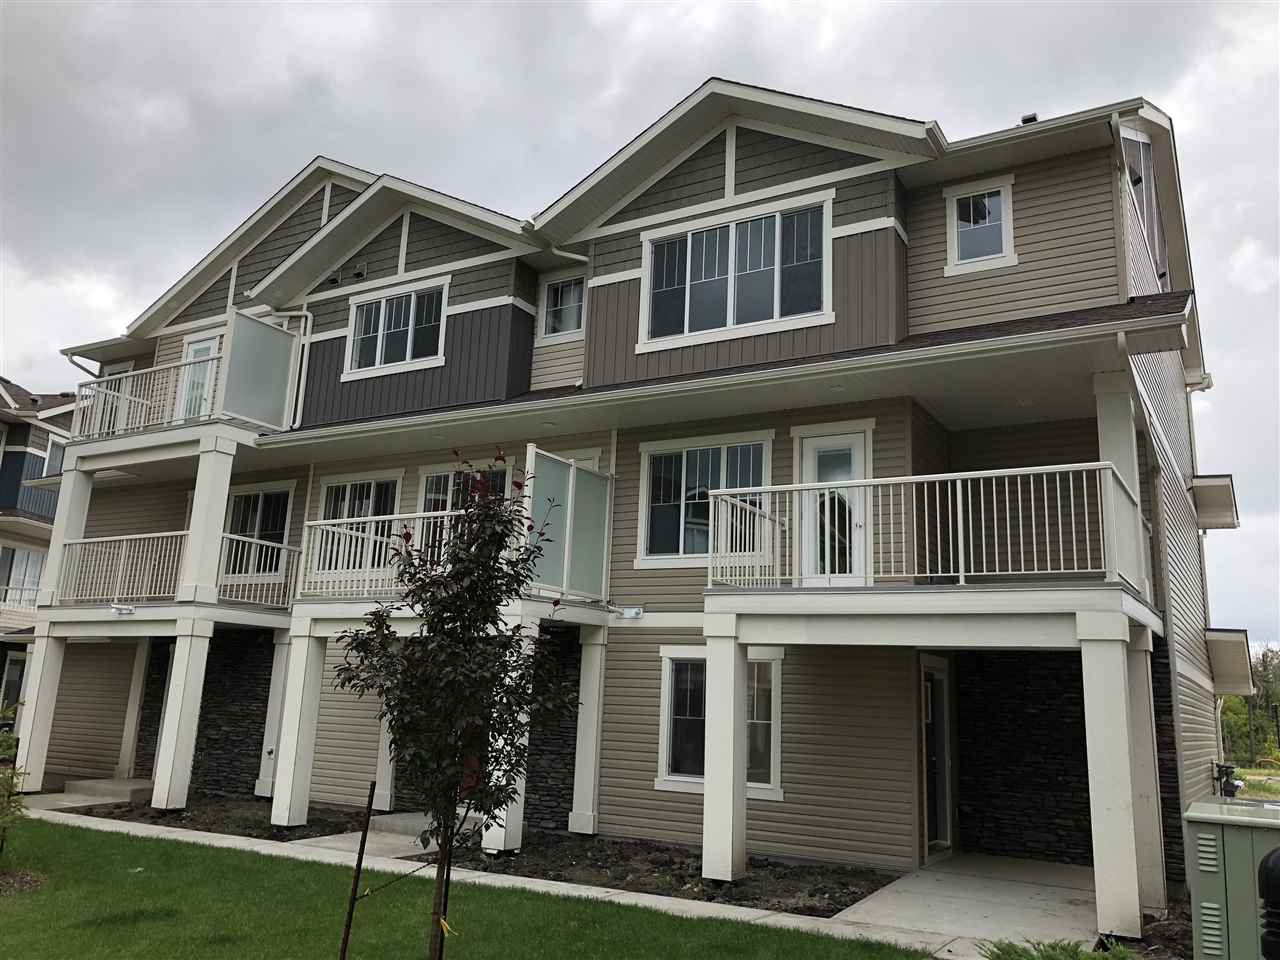 Main Photo: 88 17832 78 Street in Edmonton: Zone 28 Townhouse for sale : MLS®# E4204098